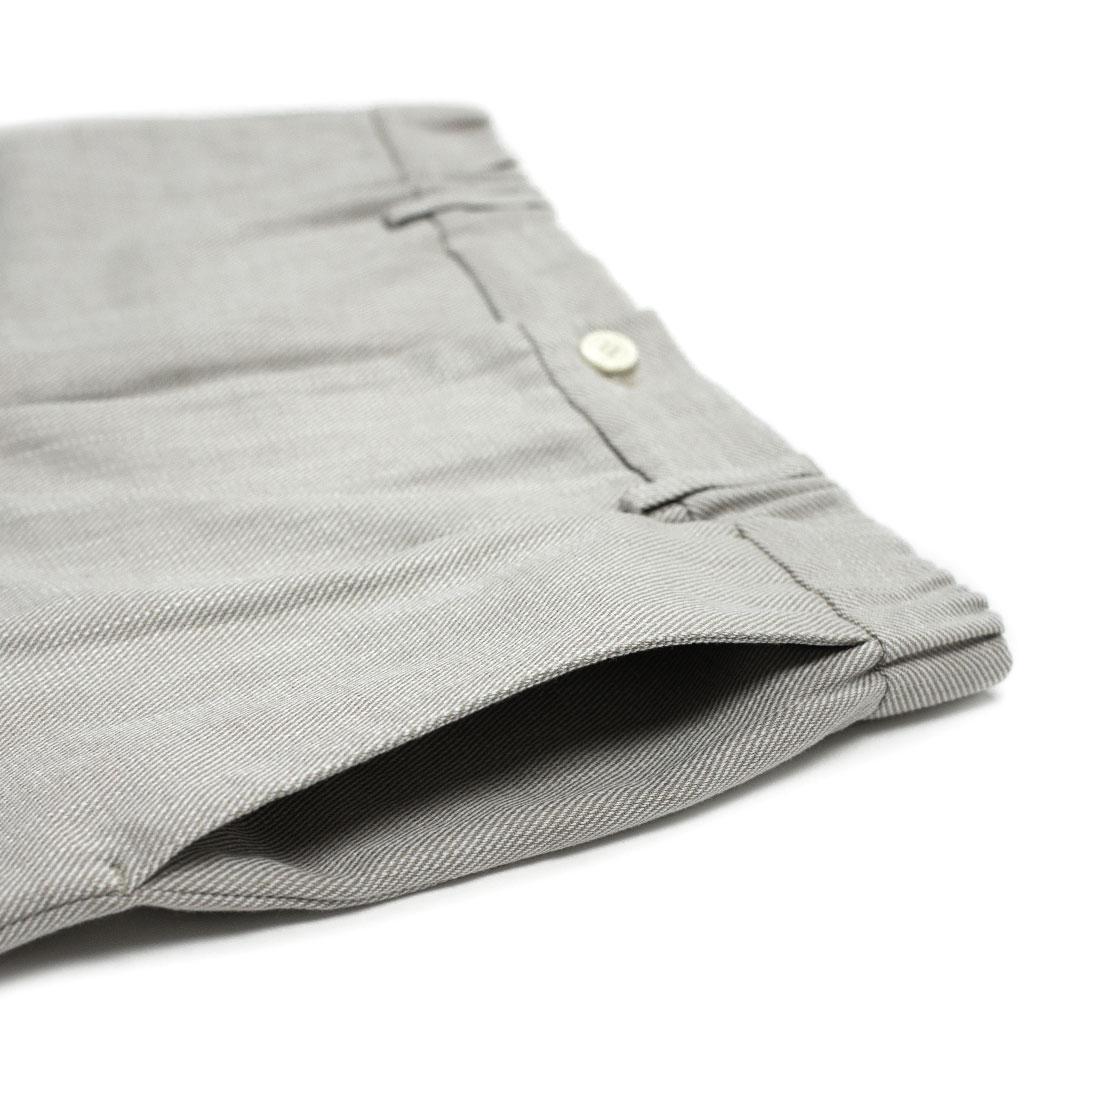 Stephan Schneider Spring Summer 2021 SS21 cotton twill easy pants (5).jpg